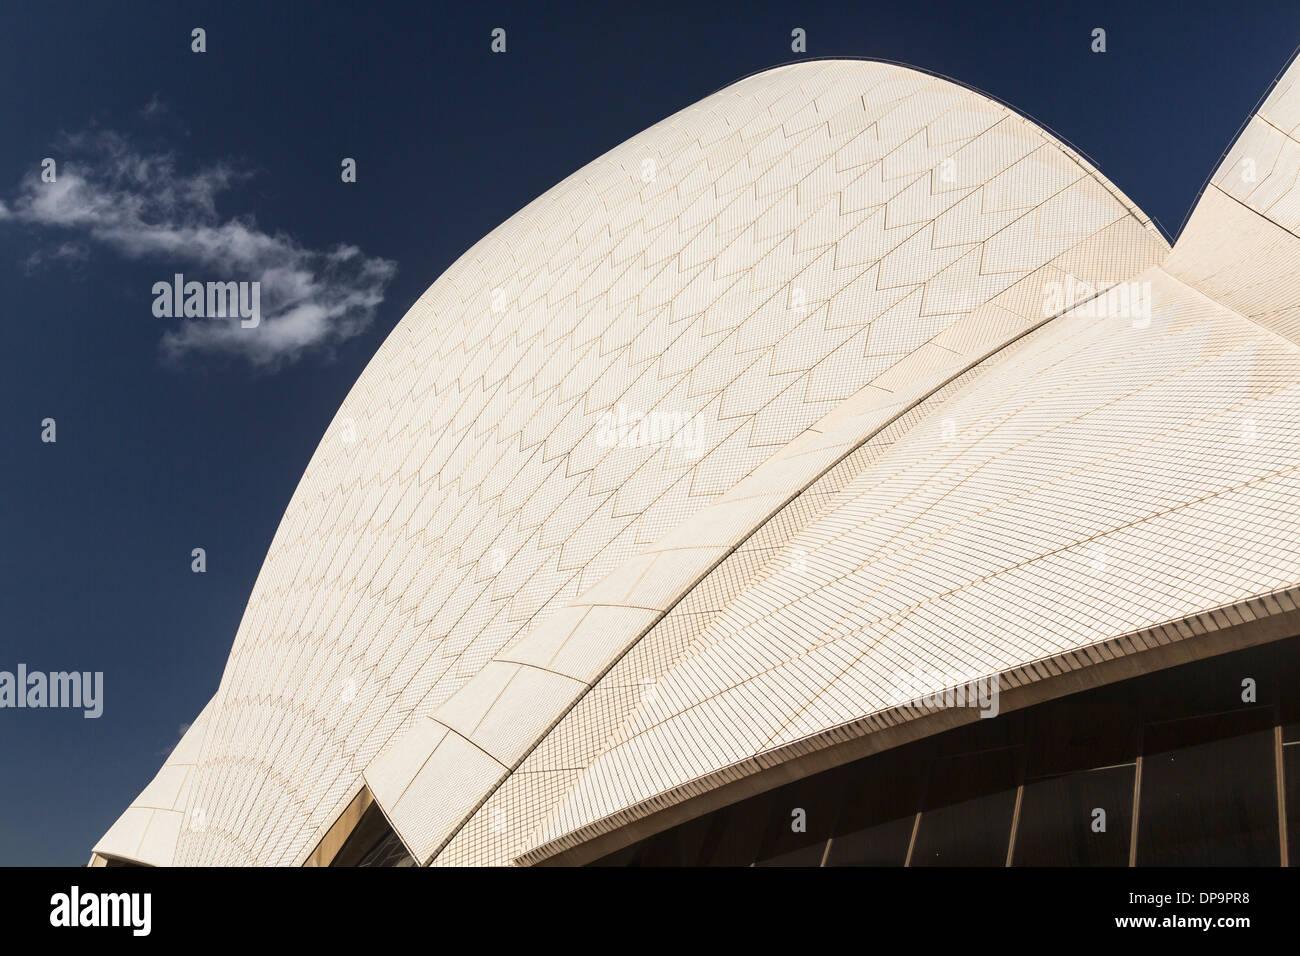 Detalle arquitectónico de la moderna arquitectura del techo de la Ópera de Sydney, Australia Imagen De Stock